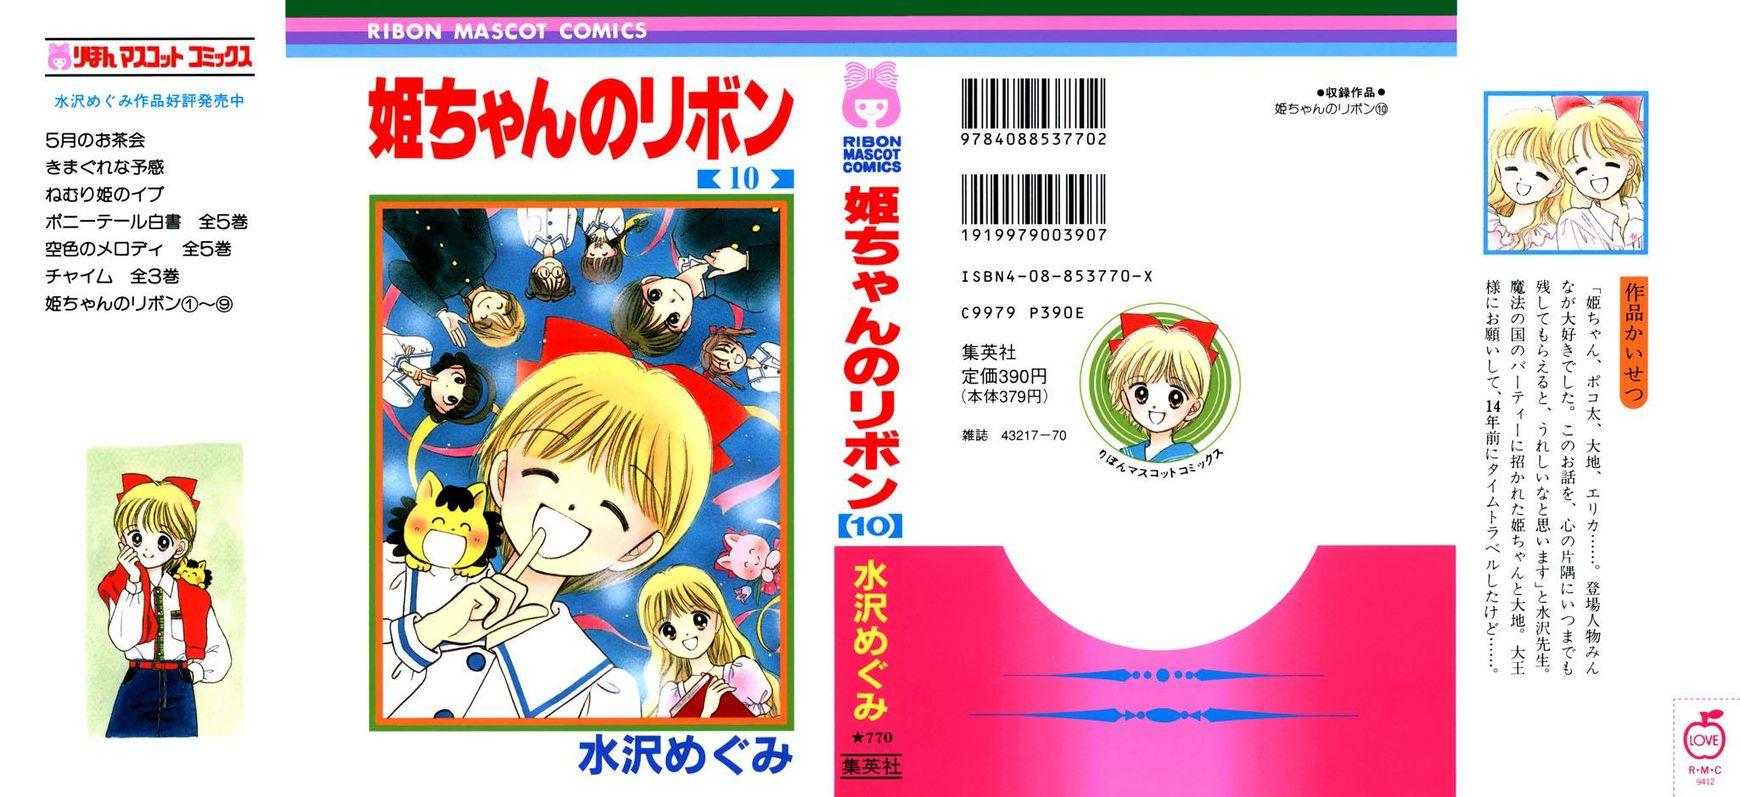 Hime-chan no Ribon 39 Page 2